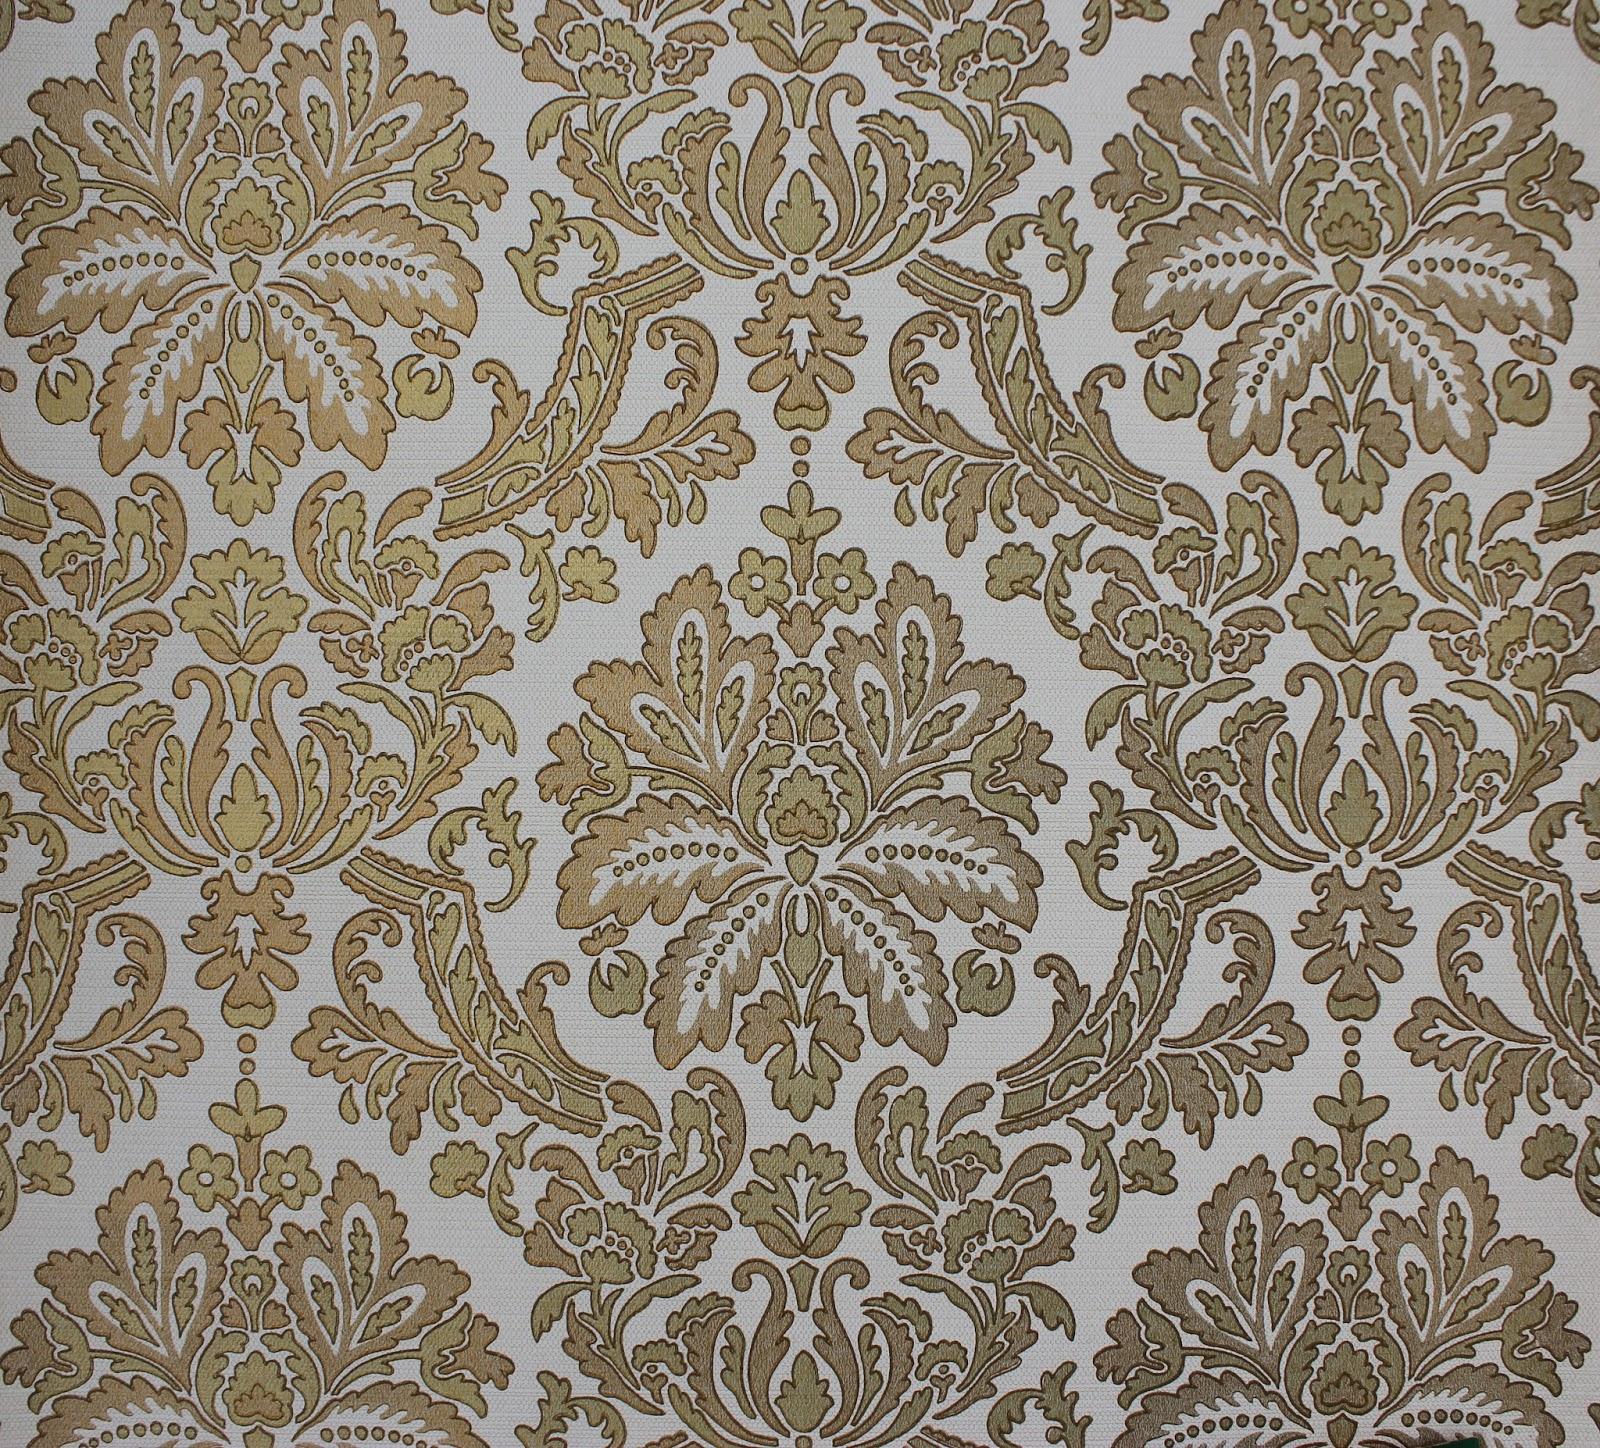 rosies vintage wallpaper vintage damask wallpaperetsy